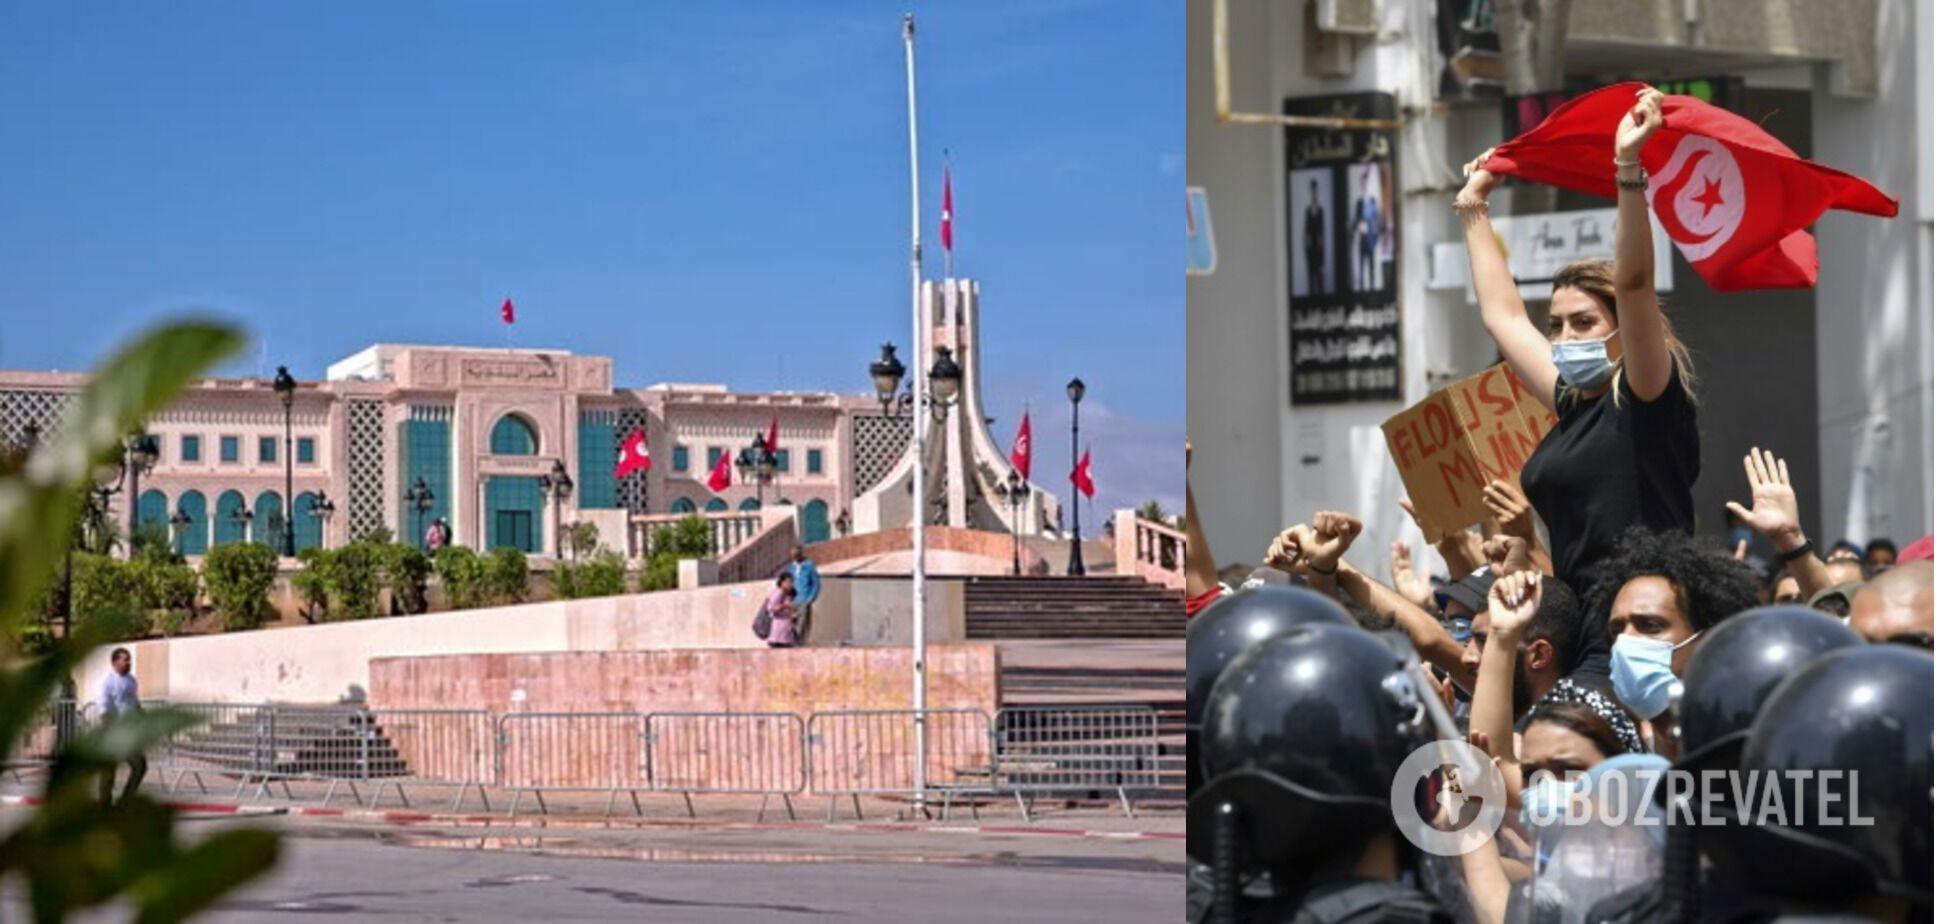 Президент Туниса распустил парламент после акций протеста